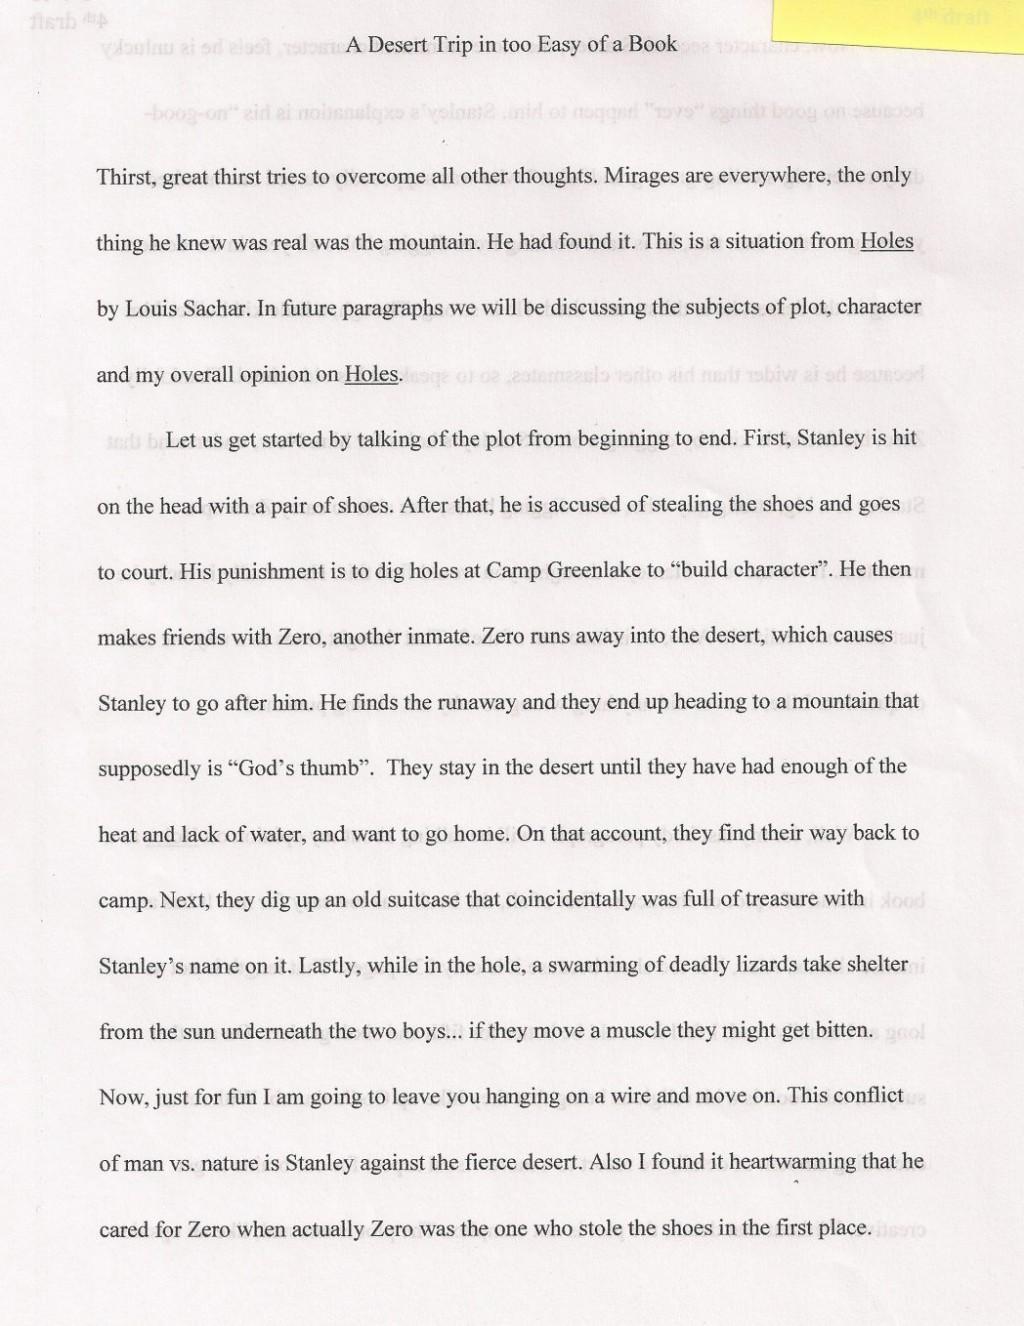 003 Sample Argumentative Essay High School Persuasive On Wearing Uniforms Conclusion Paragraph Desert 1048x1358 Example Breathtaking Holes Black Large